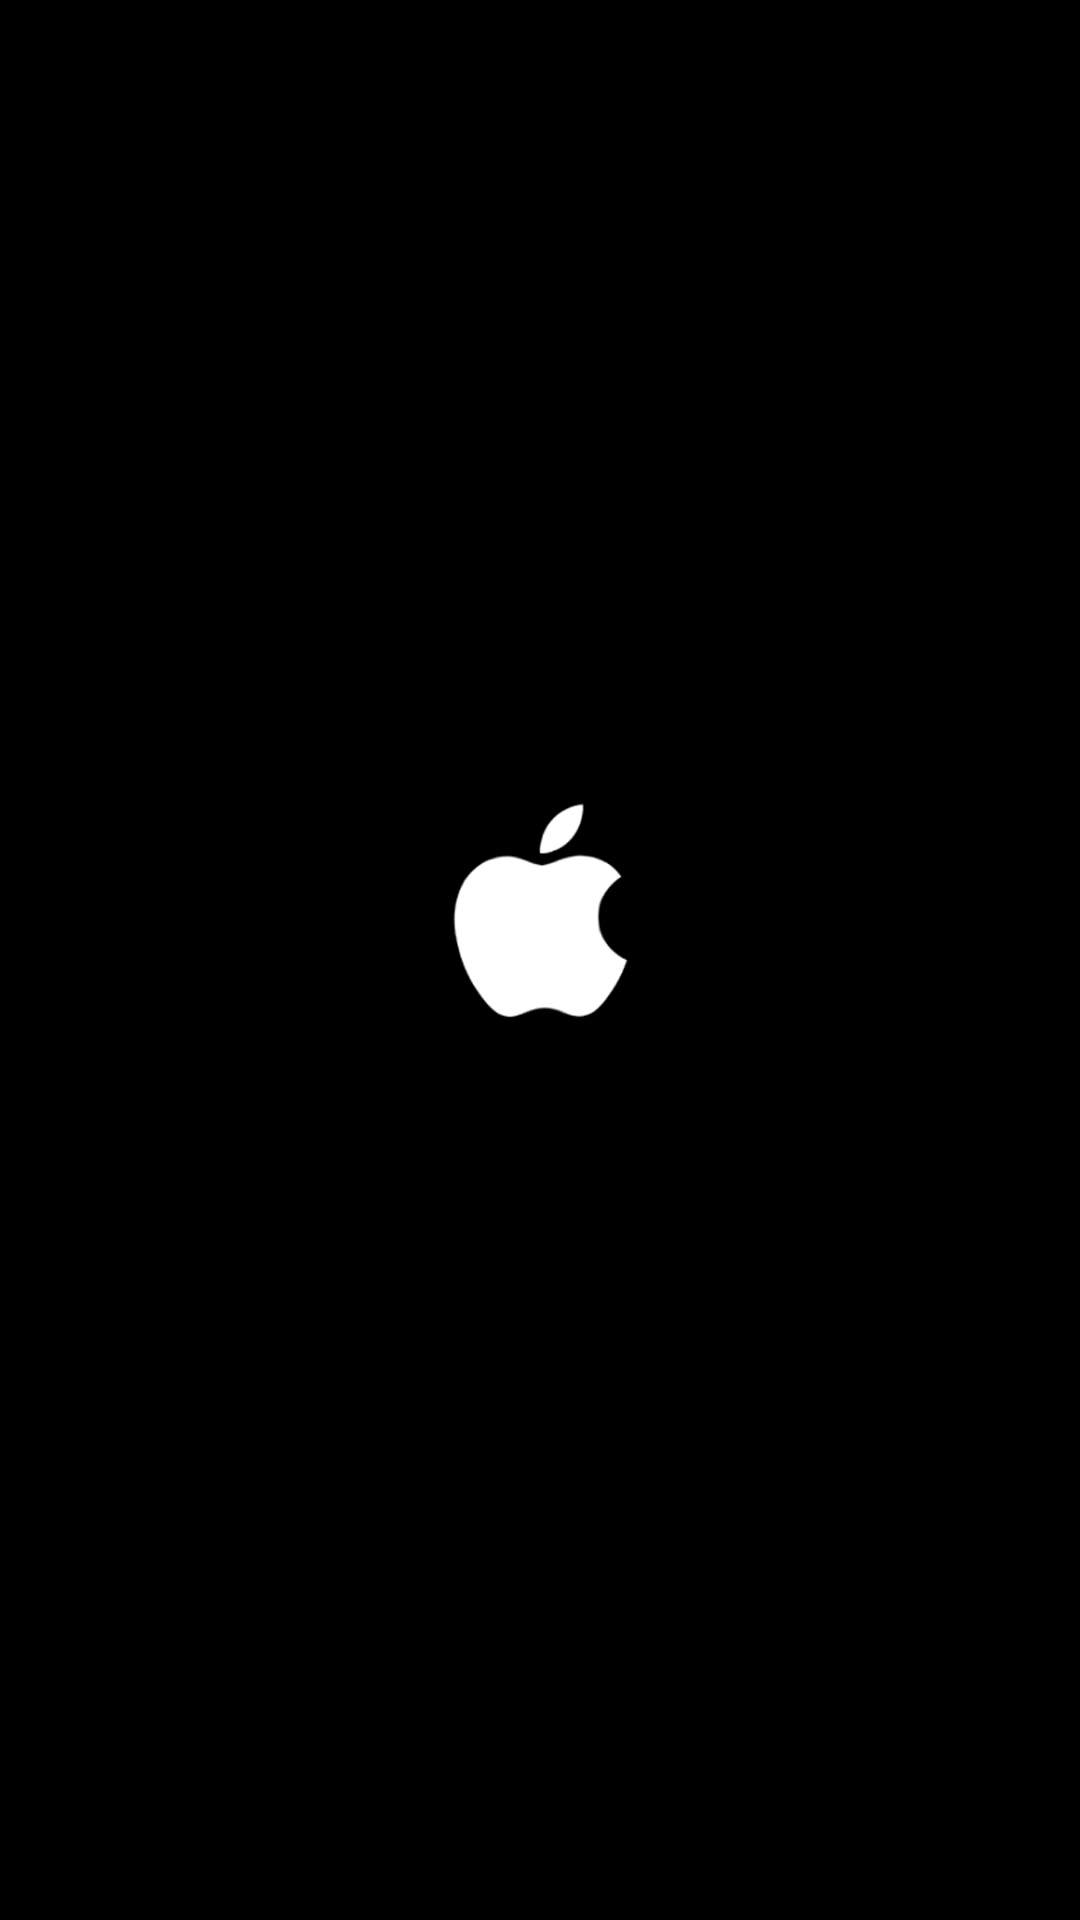 List of Premium Black Wallpaper Iphone Dark Ipad for iPhone X Today